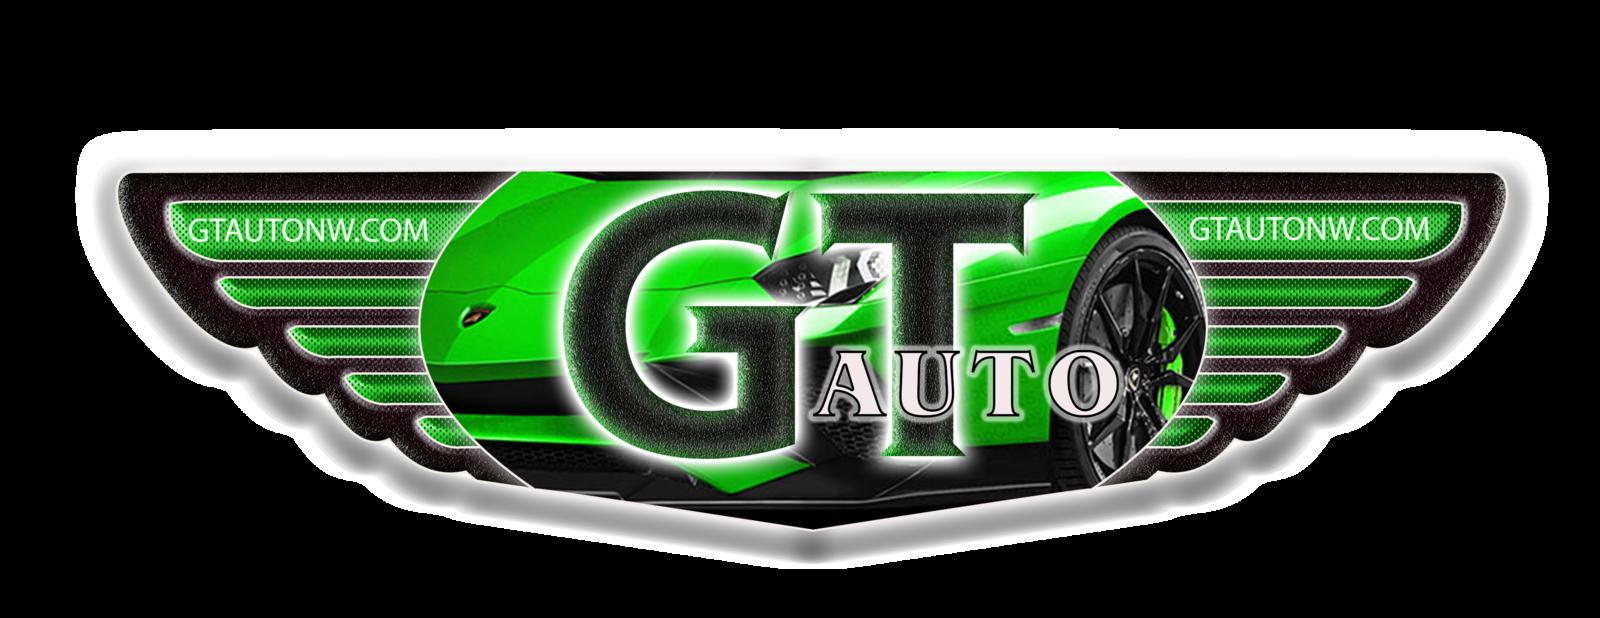 Gt Auto Sales >> Gt Auto Sales Service Tacoma Wa Read Consumer Reviews Browse